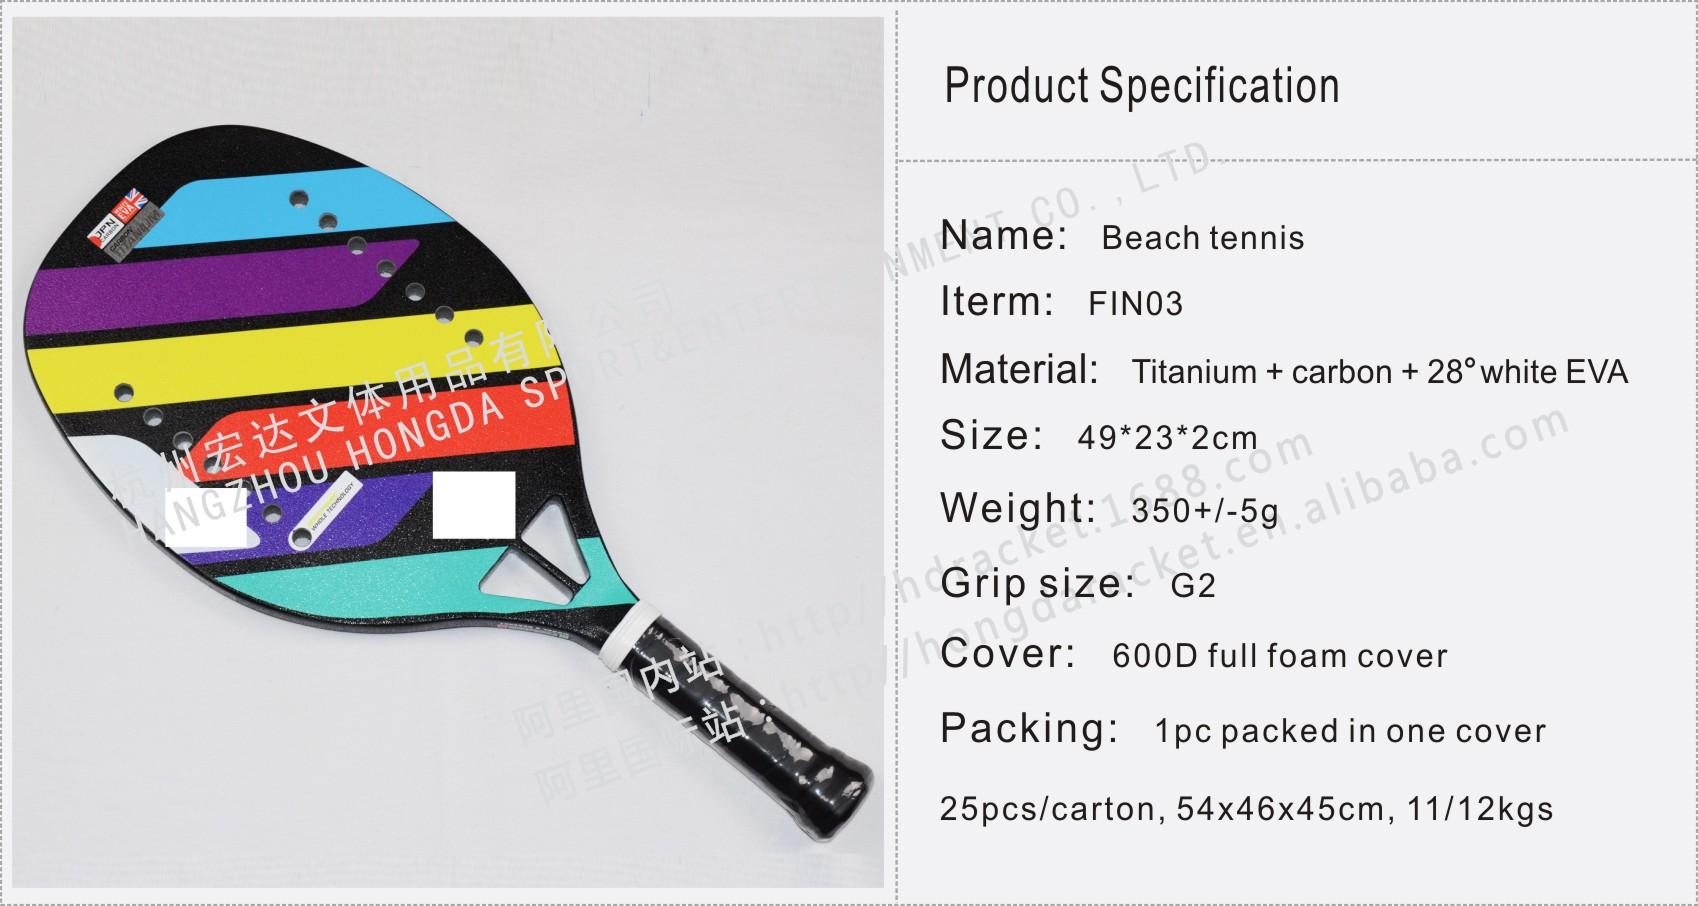 Oem Factory Wholesale Good Quality Titanium & Carbon Fiber Beach Tennis  Racket/racquet - Buy Professional Beach Racket,Good Quanlity Beach